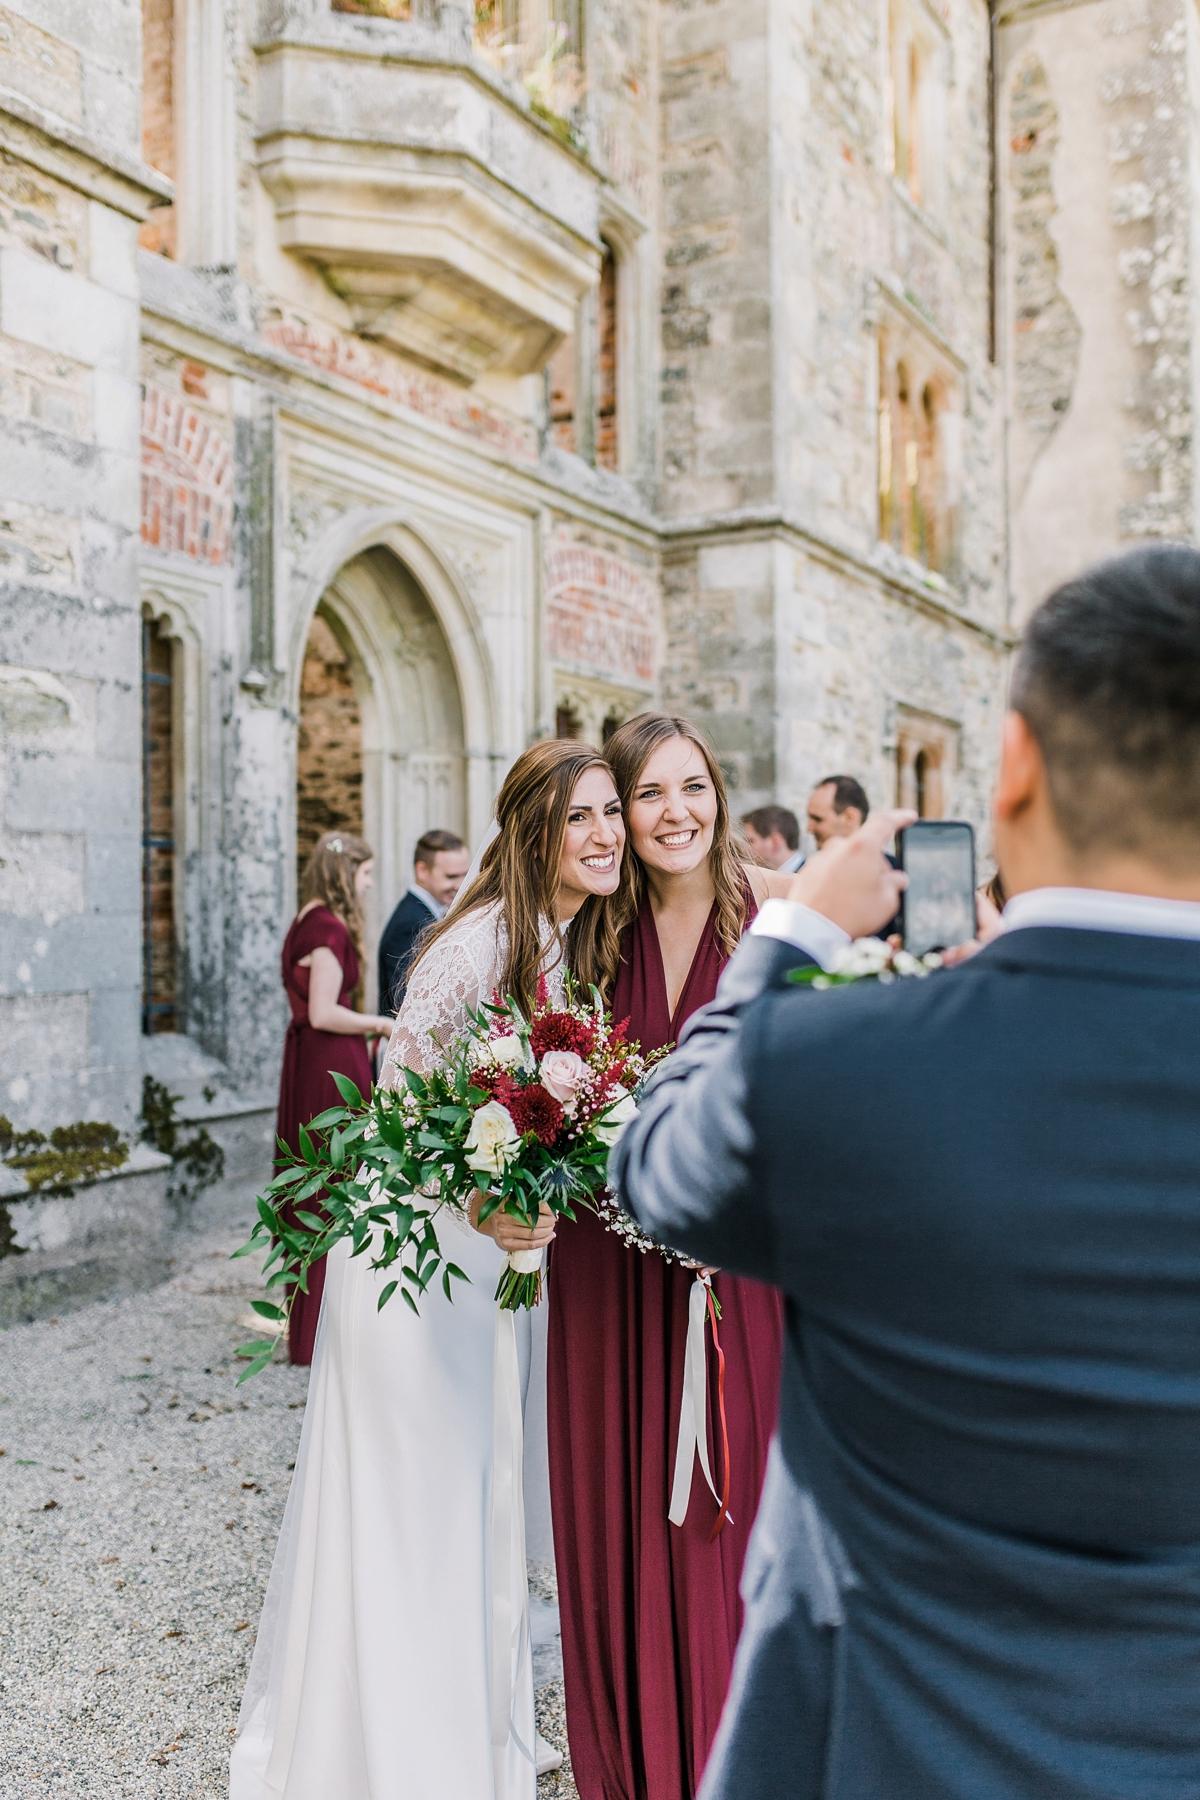 020d9de130b5 bhldn intimate irish castle wedding - BHLDN Separates + a First Look for an  Intimate Irish